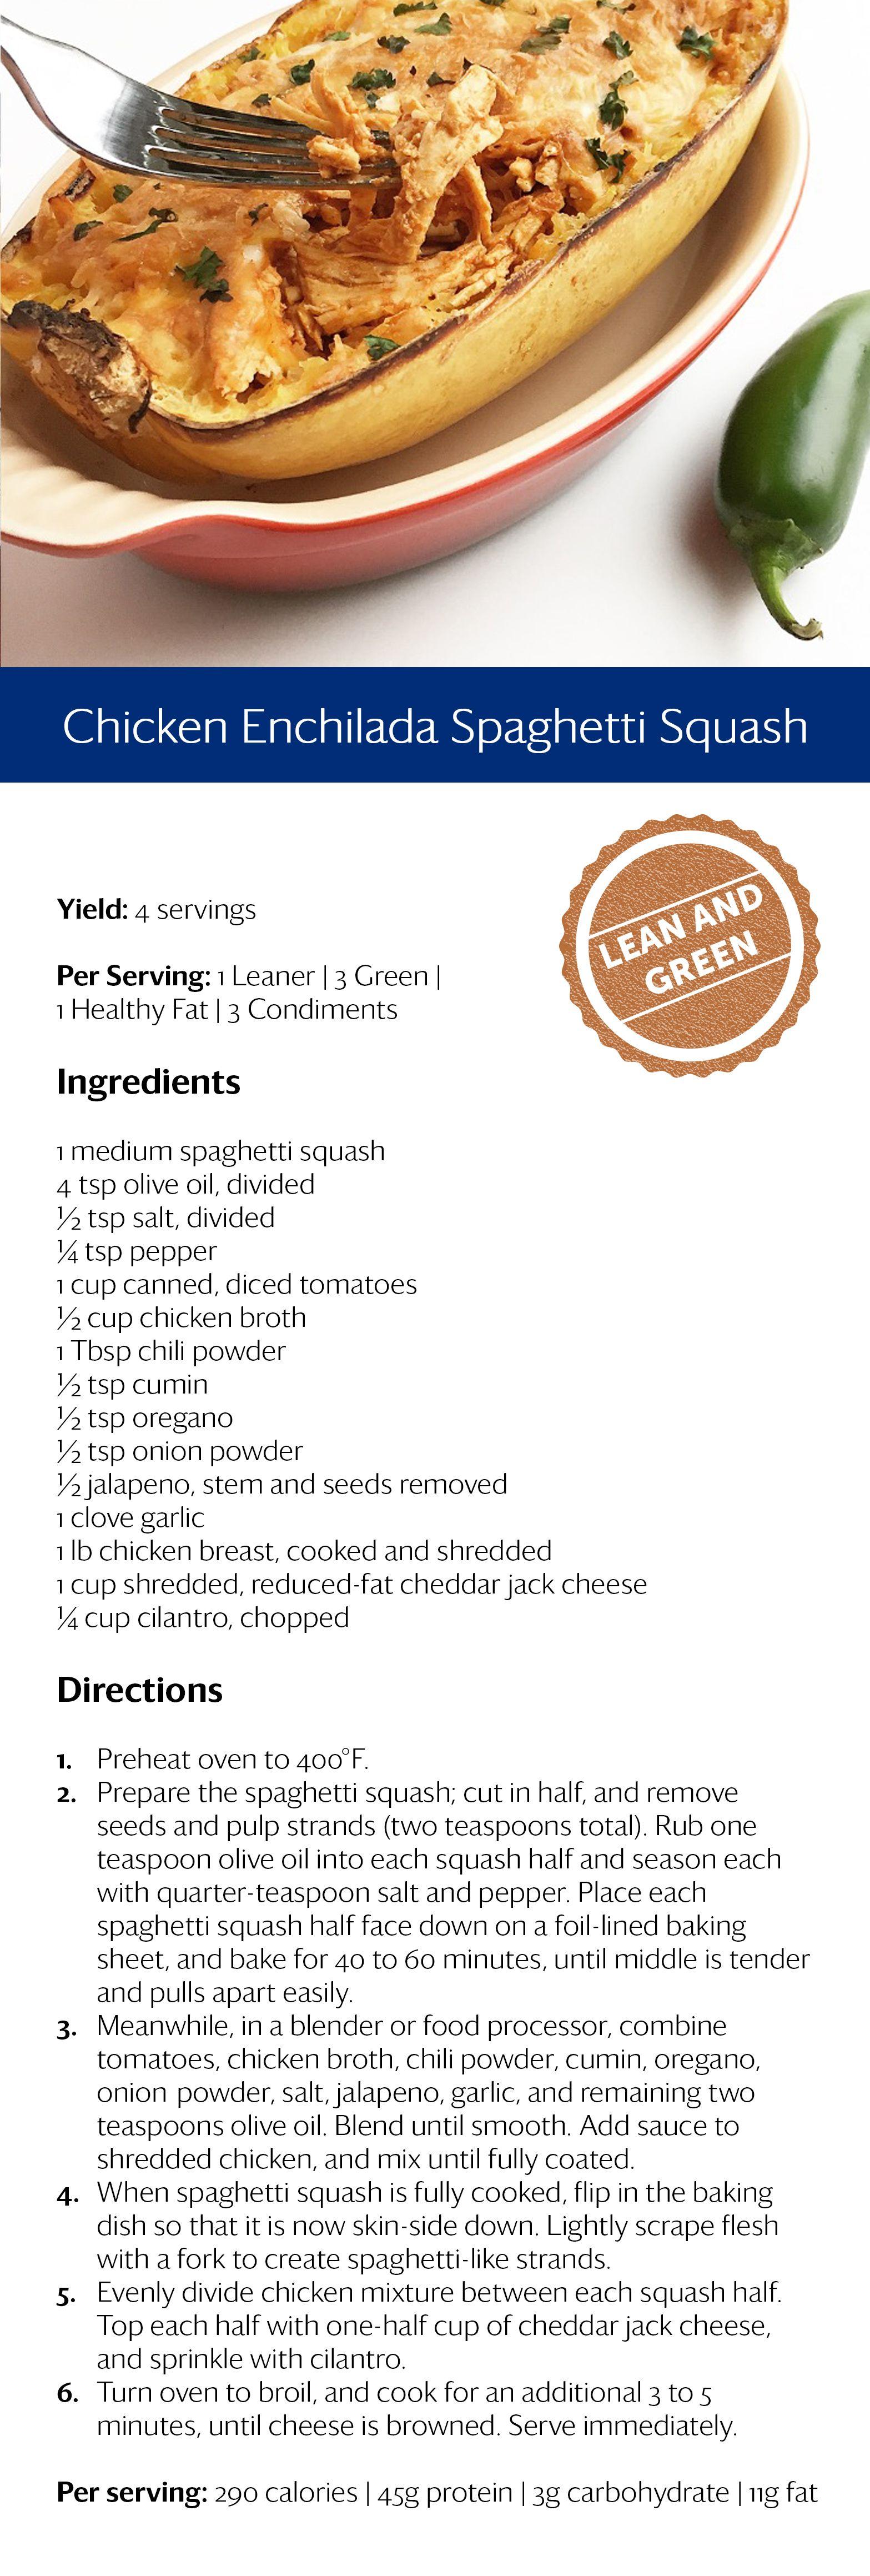 Chicken Enchilada Spaghetti Squash Healthy Recipes Lean